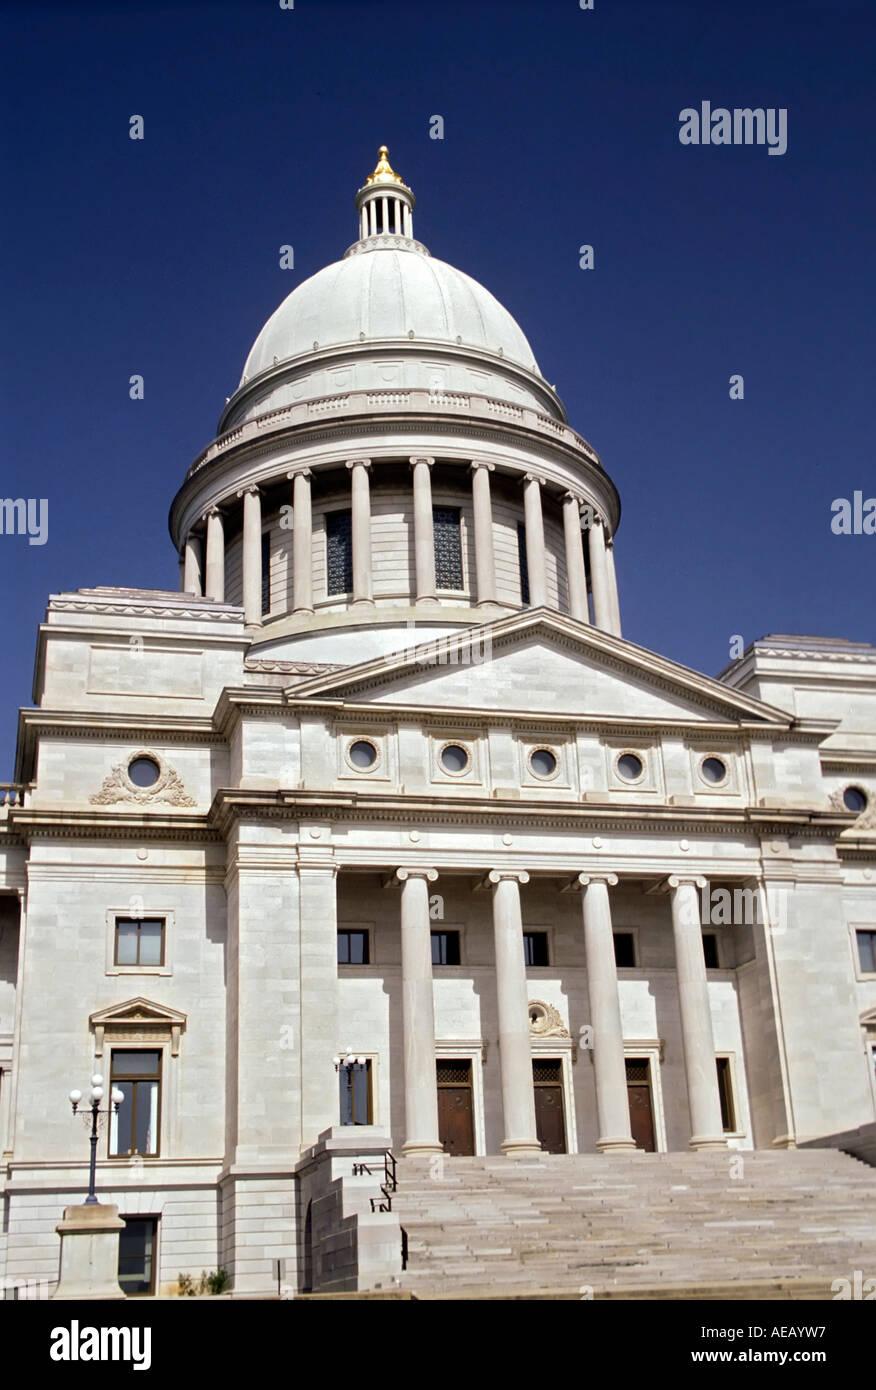 Arkansas state capitol dome stock photos arkansas state capitol the state capitol building at little rock arkansas stock image malvernweather Gallery